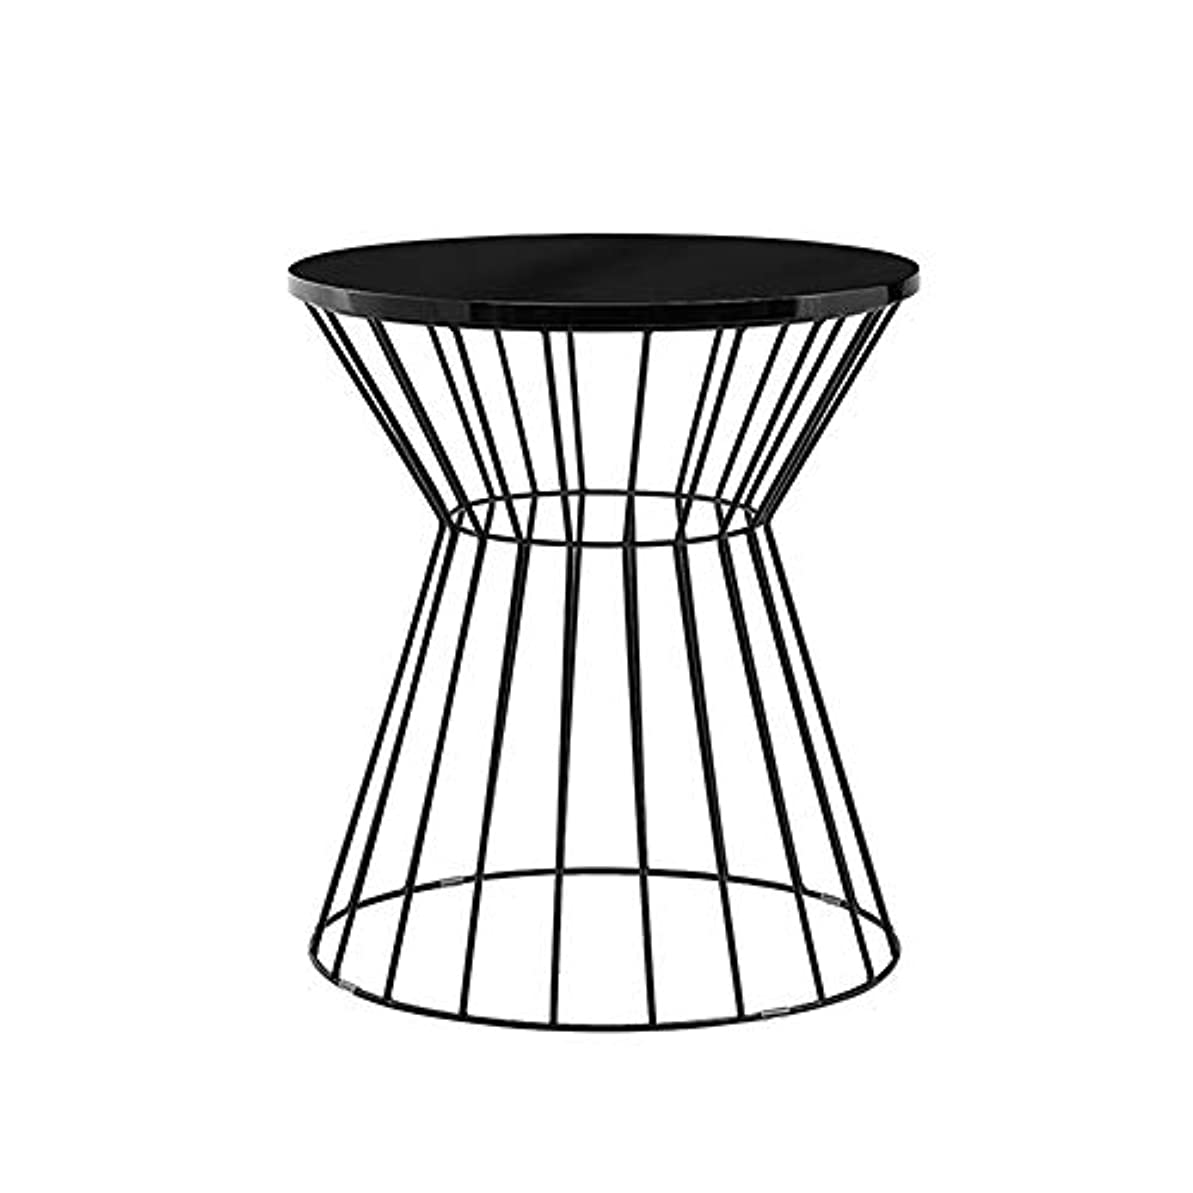 HUO 鉄の小さいテーブルのソファーの側面のテーブルの円形のコーヒーテーブルの居間の棚(金、黒)-45 * 45 * 50cm (色 : 黒)